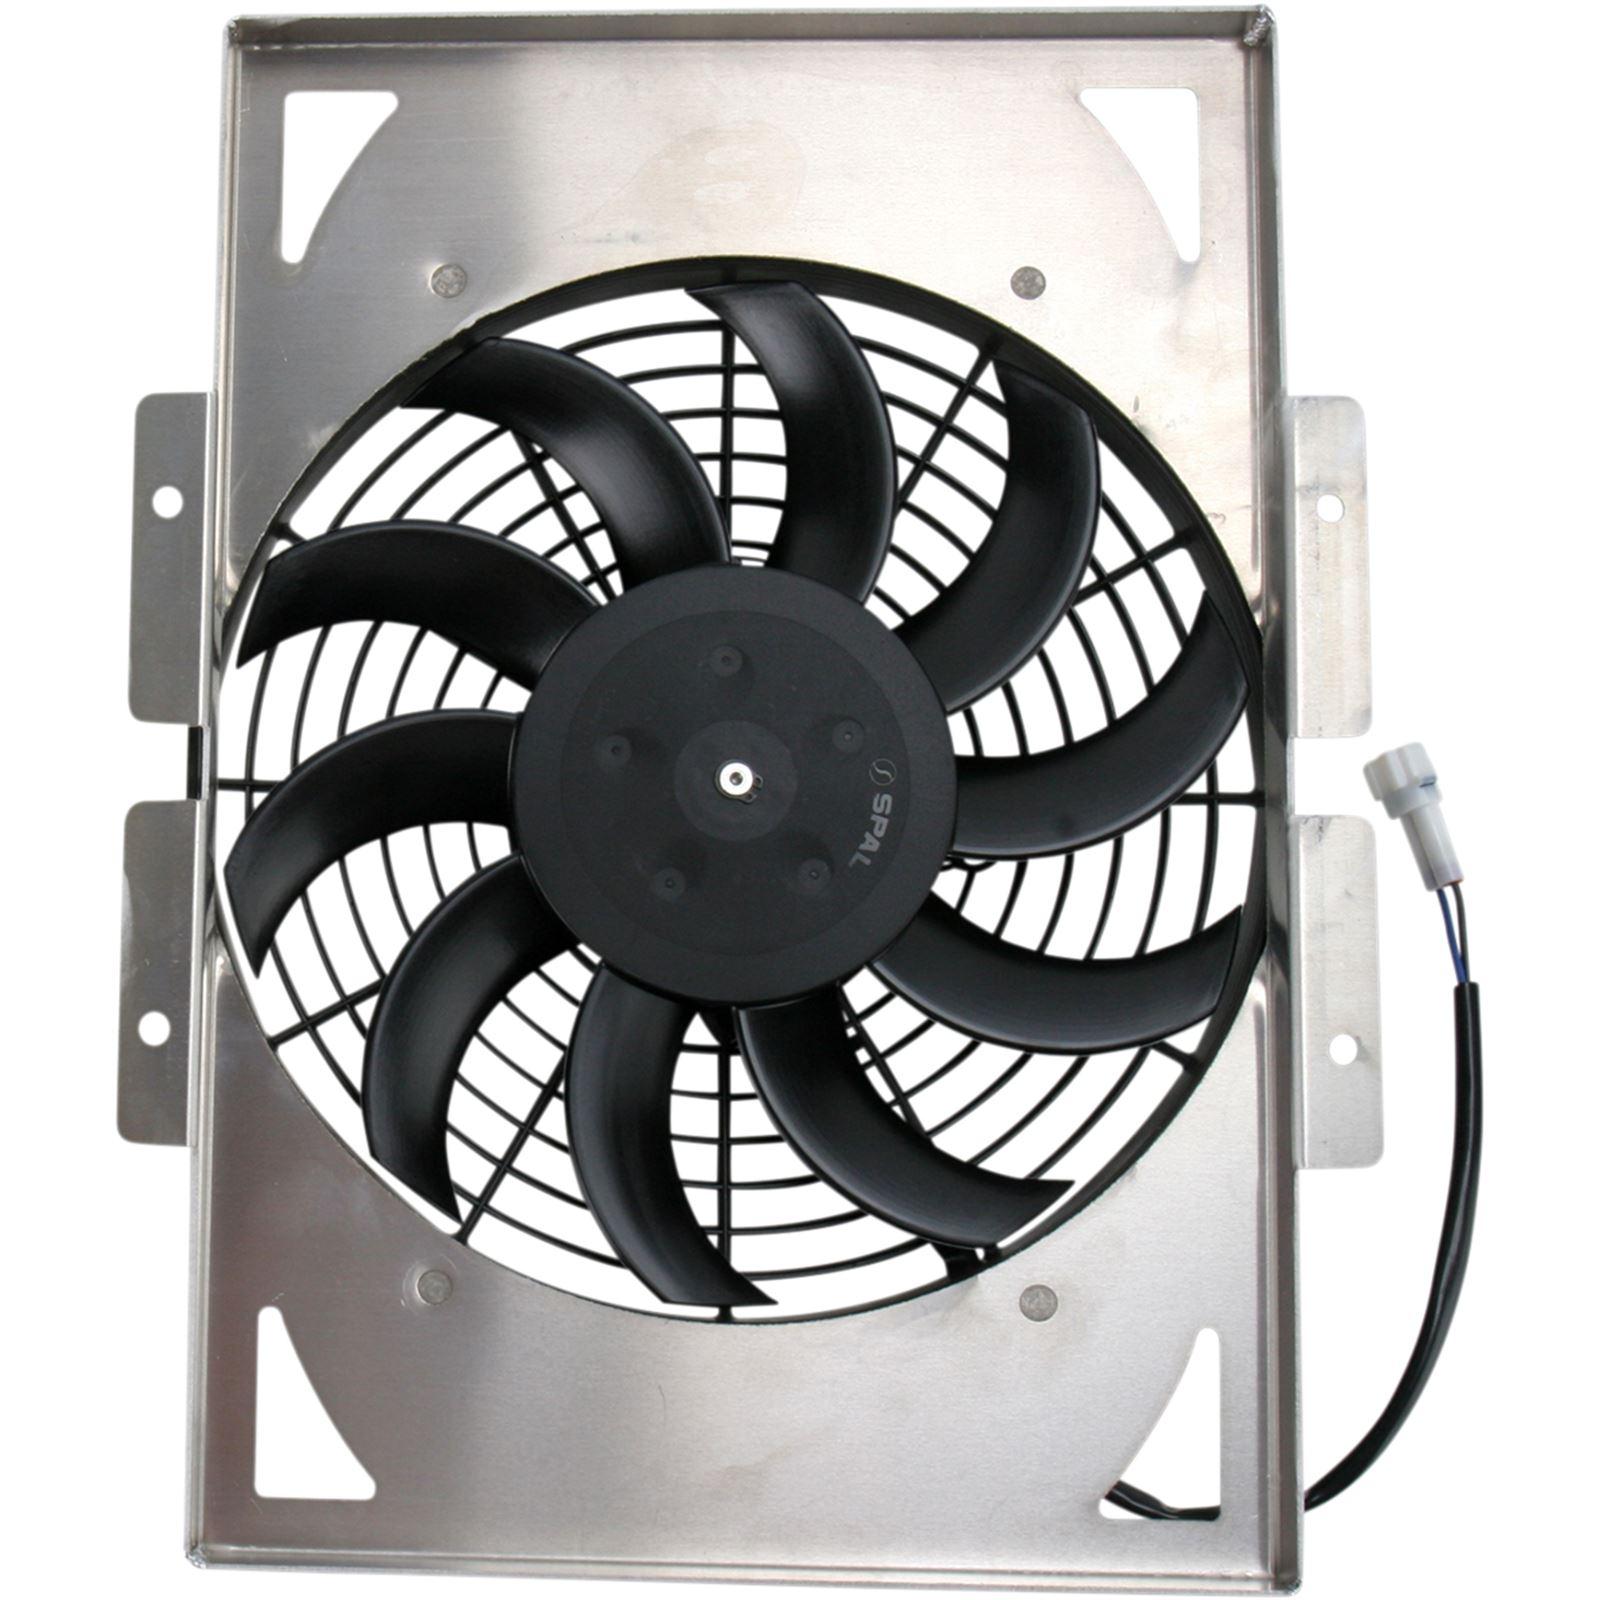 Moose Hi-Performance Cooling Fan - Single - 800 CFM